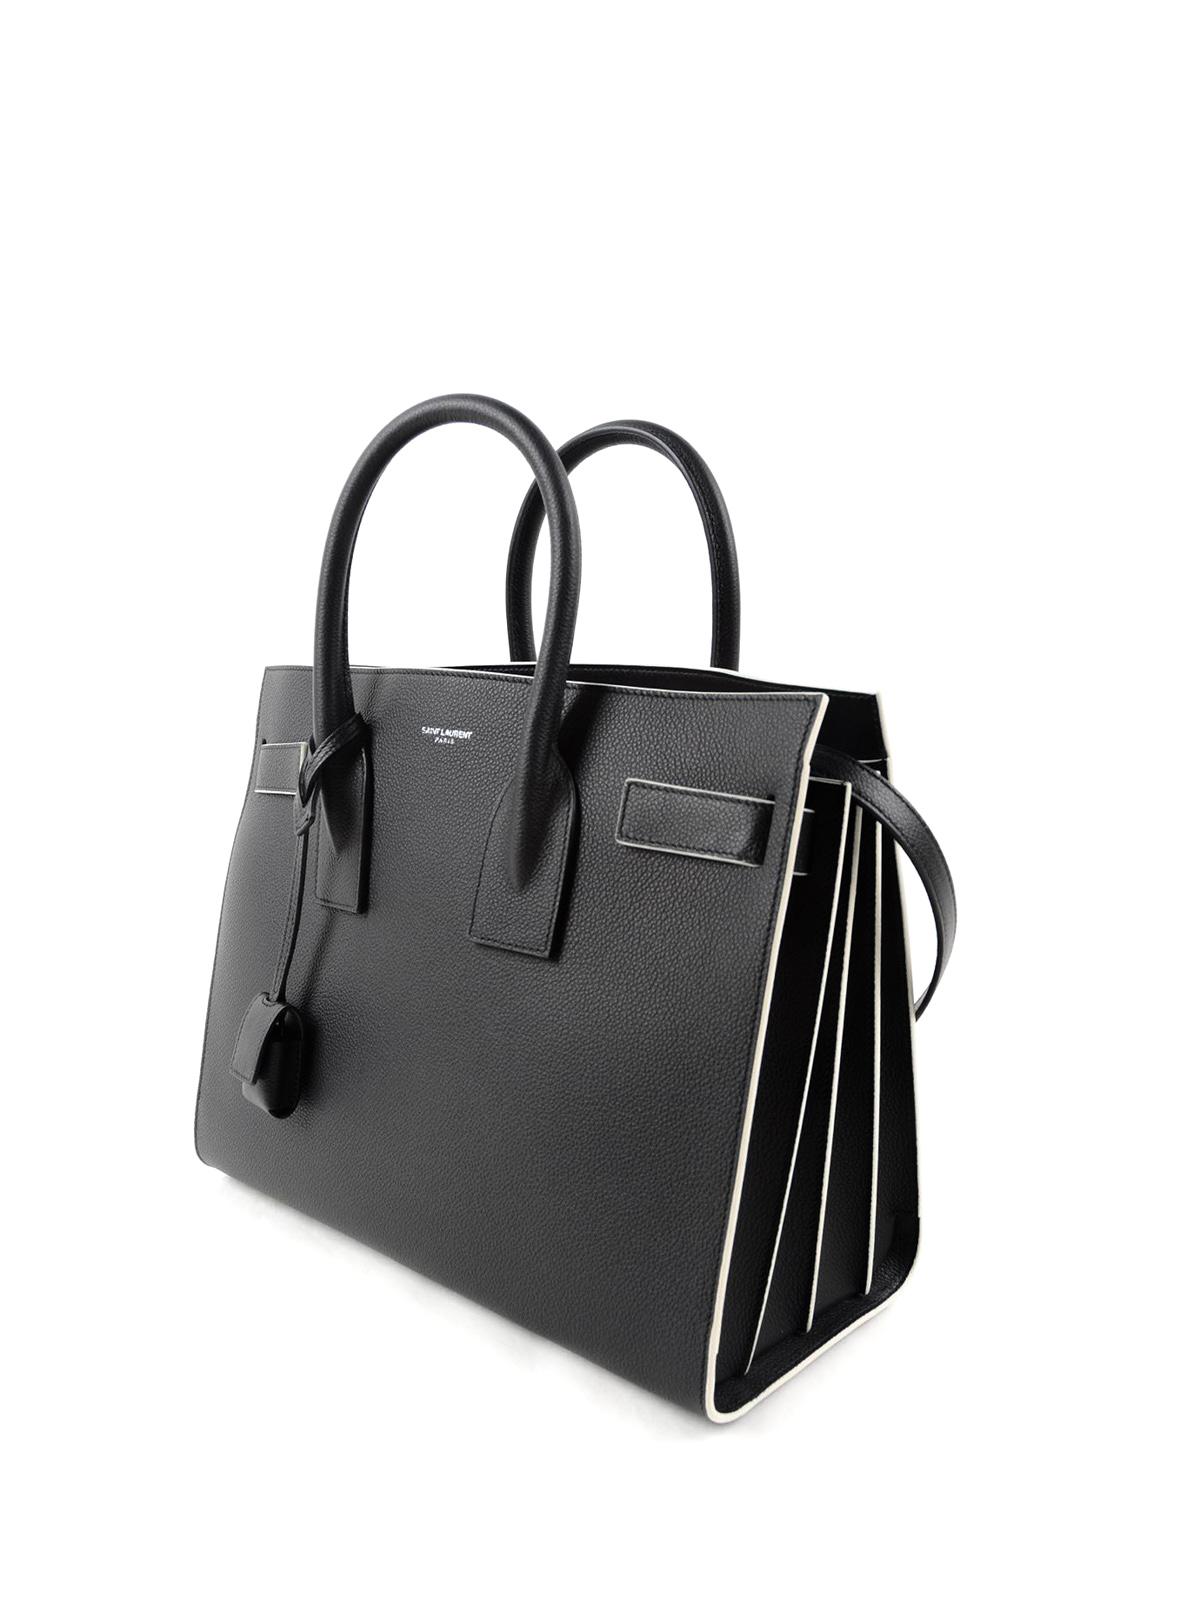 b164a0a28a0e Saint Laurent - Small Sac De Jour leather tote - totes bags - 378299 ...